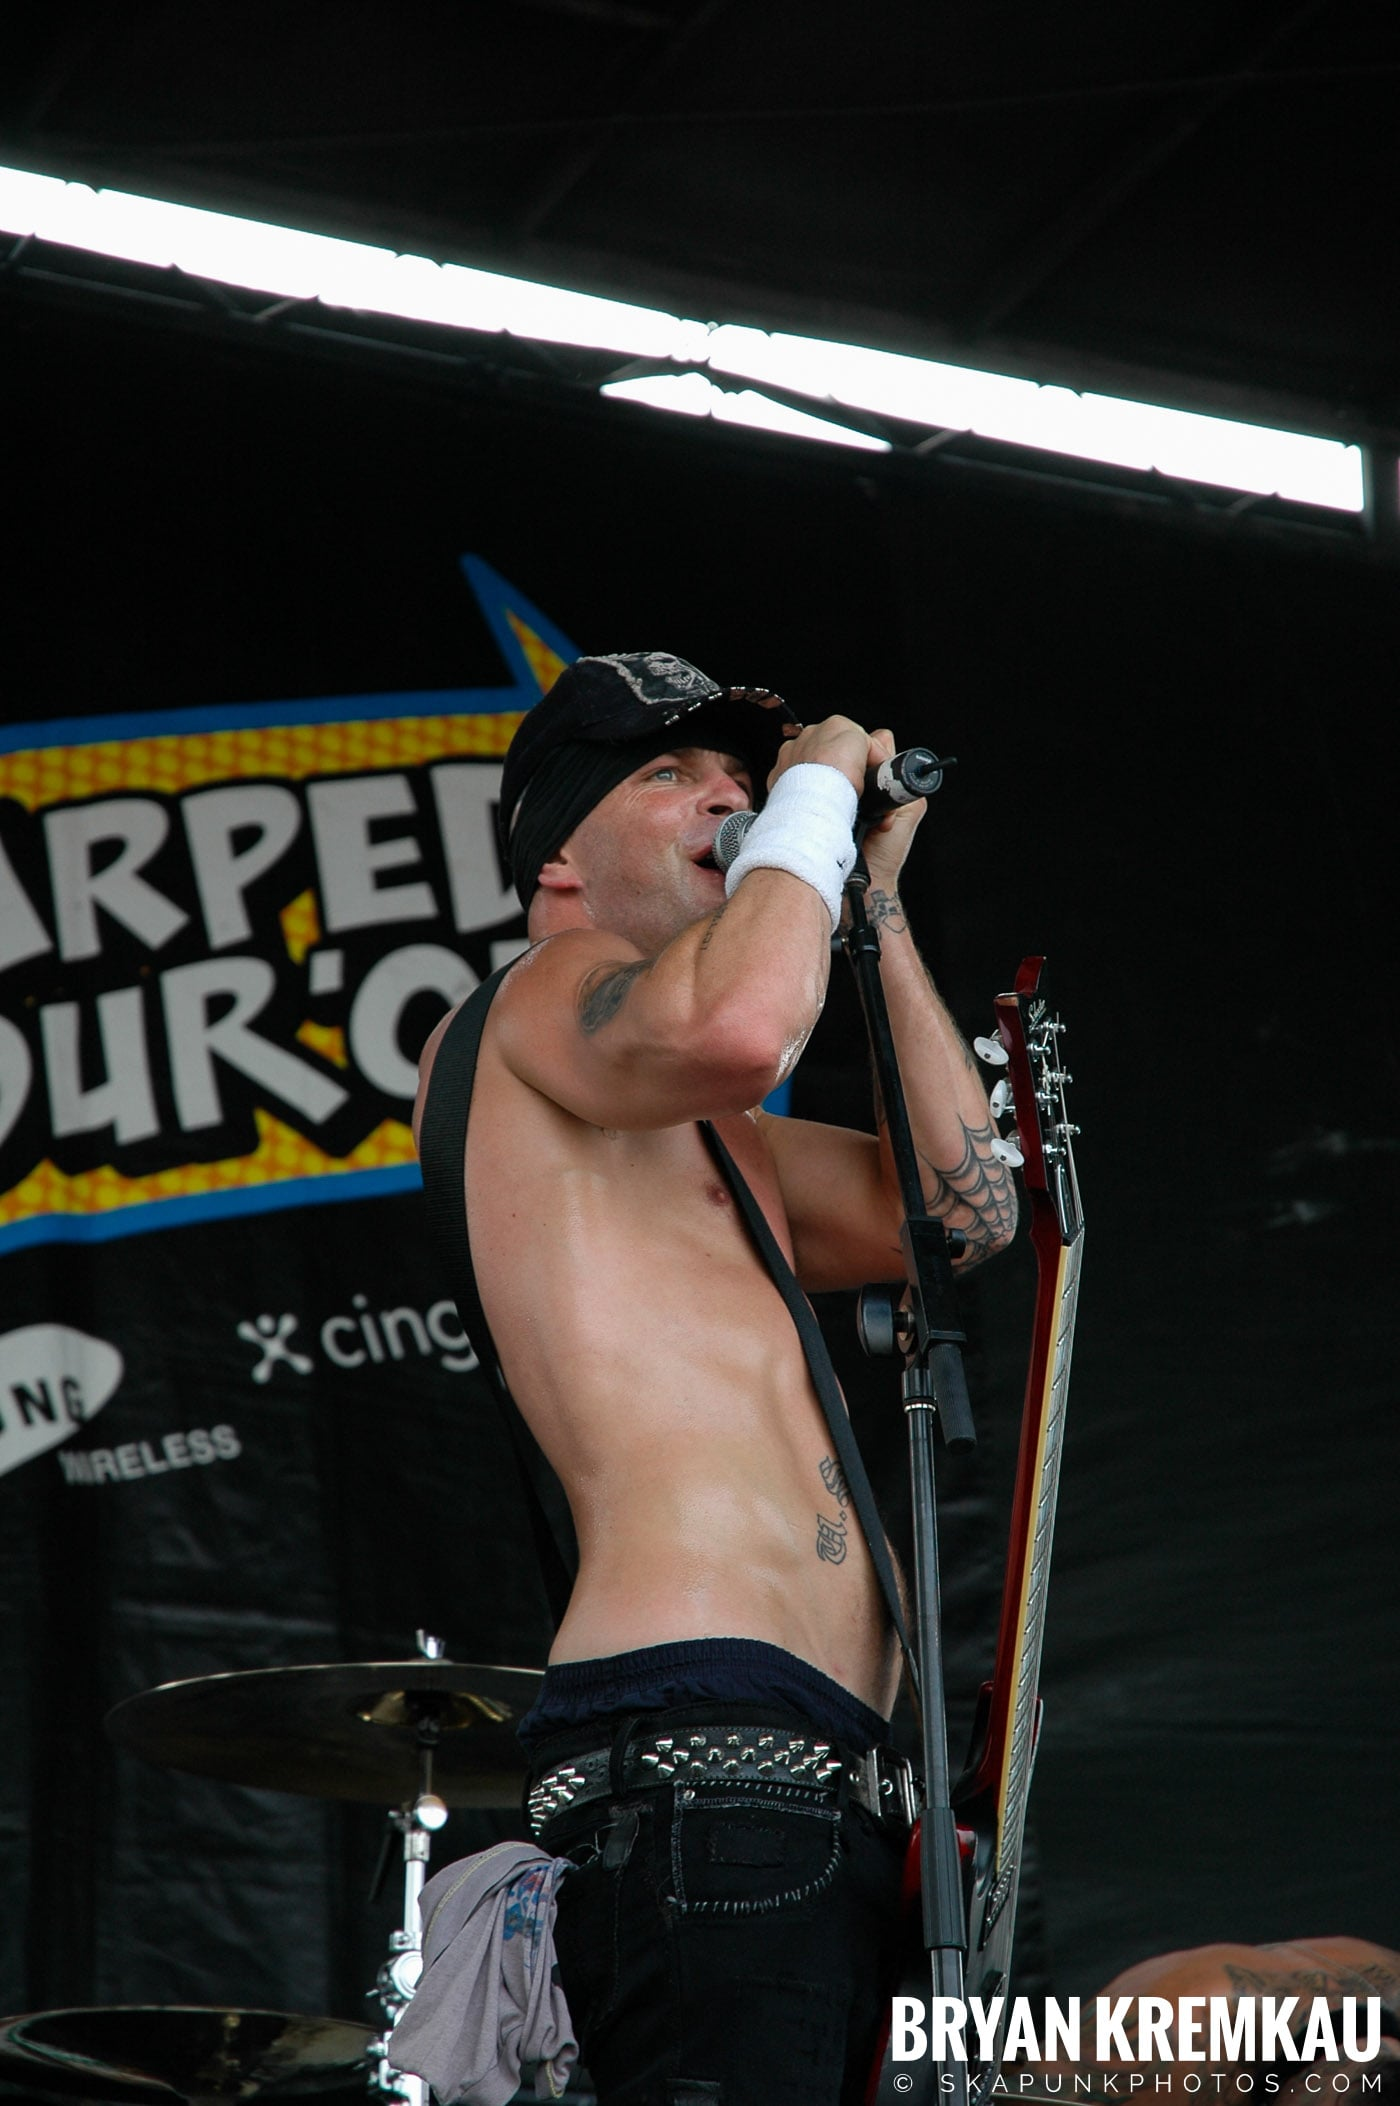 The Transplants @ Warped Tour 2005, NYC - 8.12.05 (3)